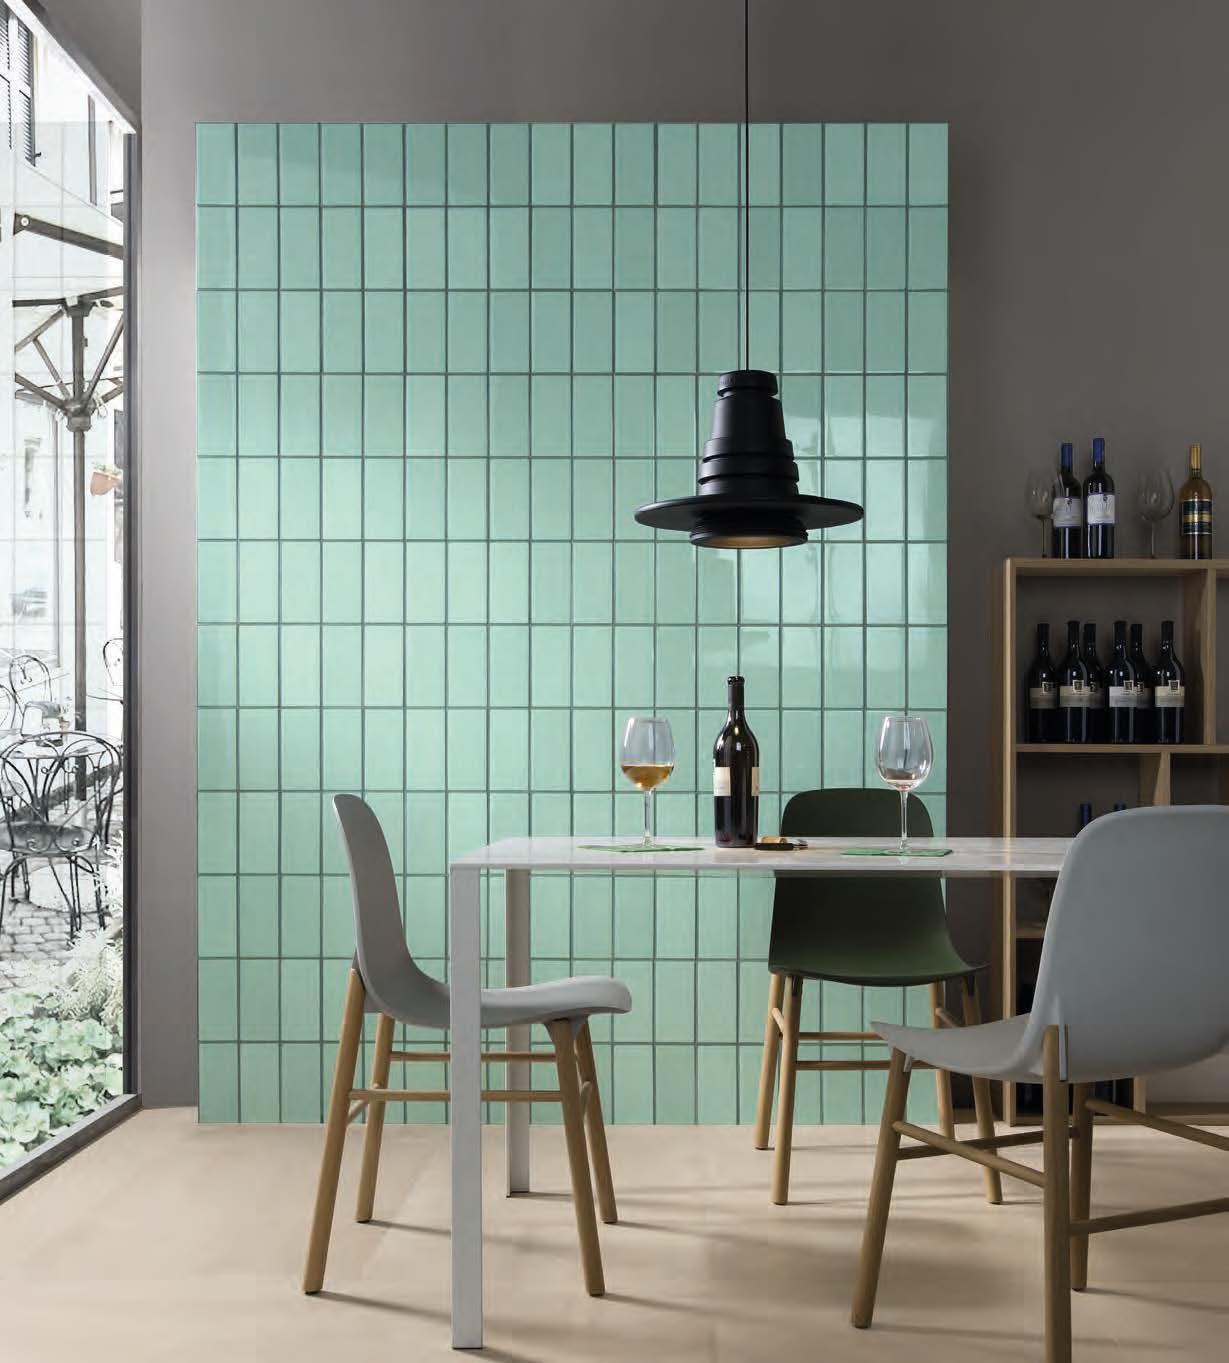 Pastel aqua tile wall in a vertical grid